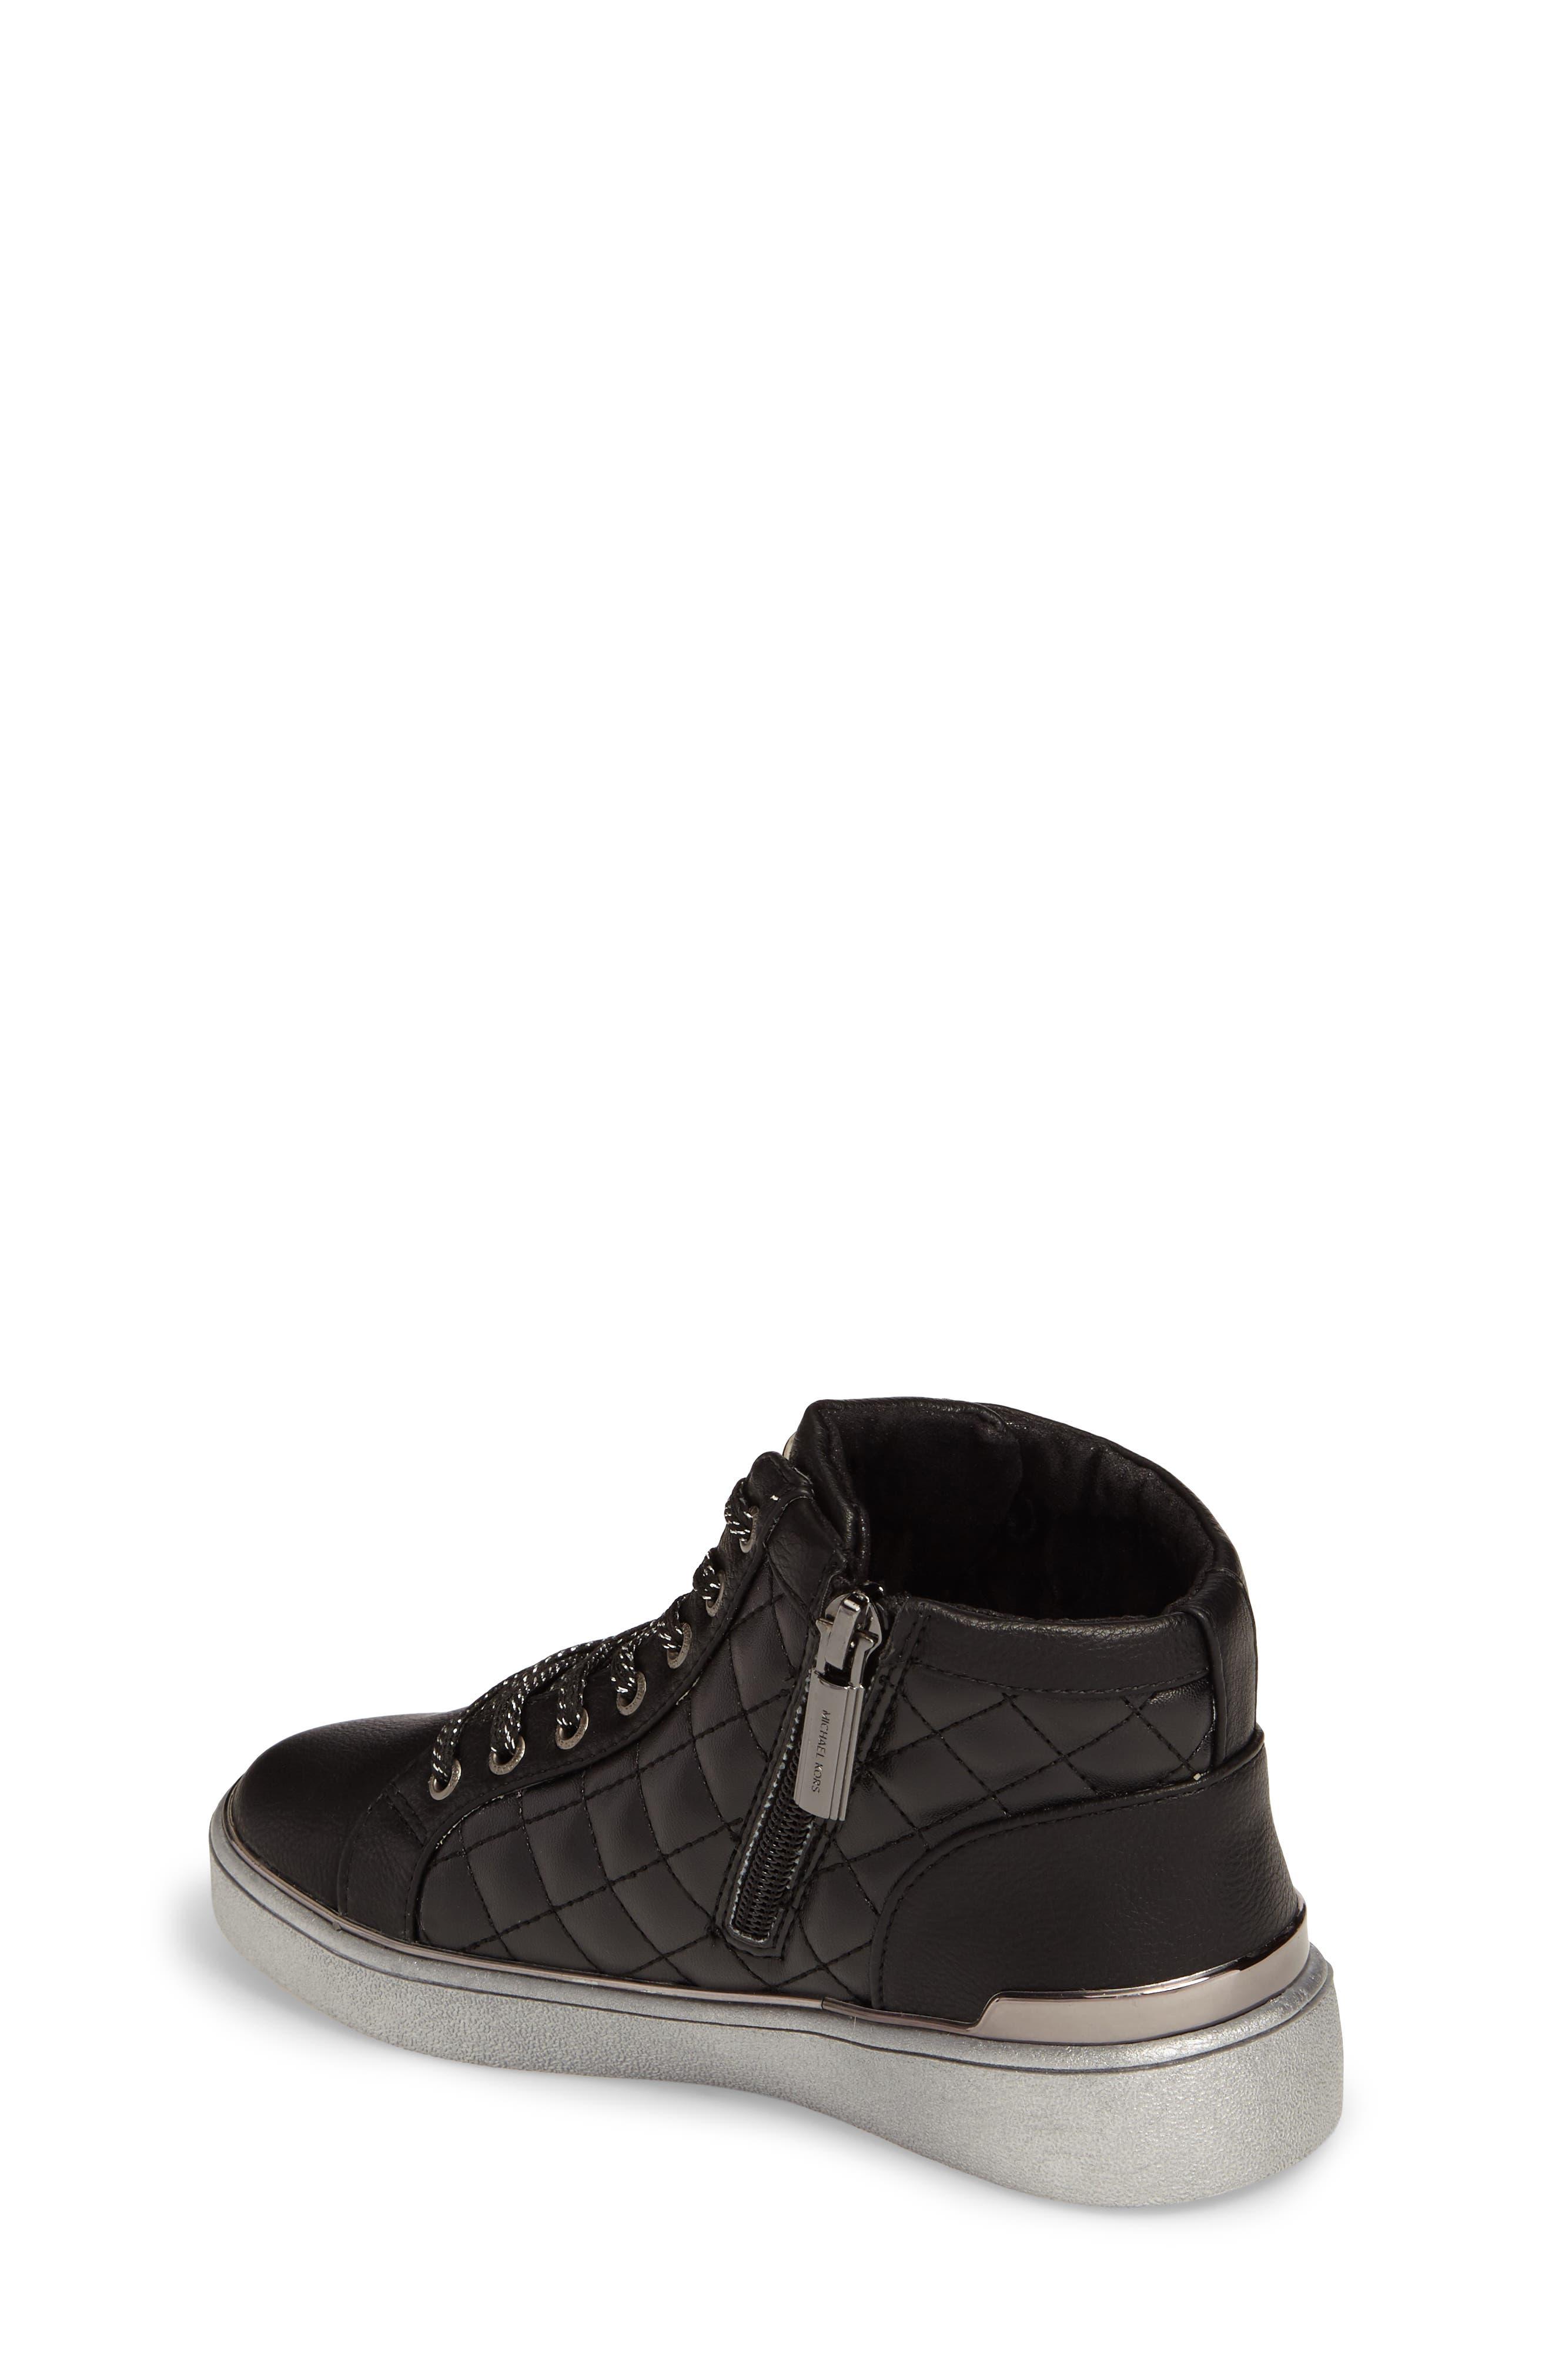 Ivy Rome Sneaker,                             Alternate thumbnail 2, color,                             Black